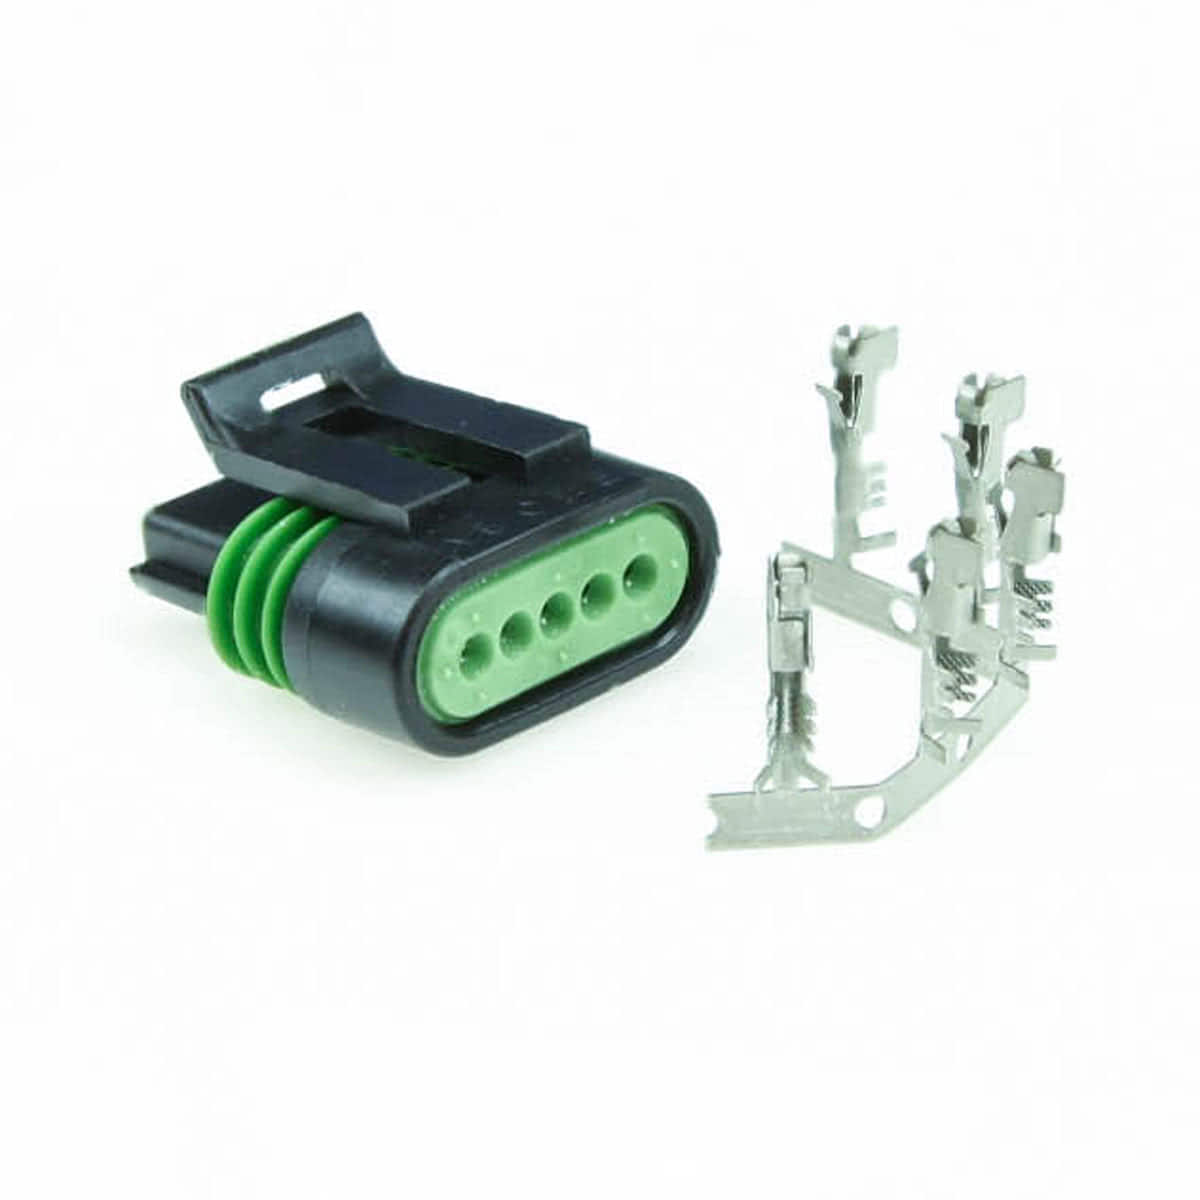 Ignition/Coil Connectors